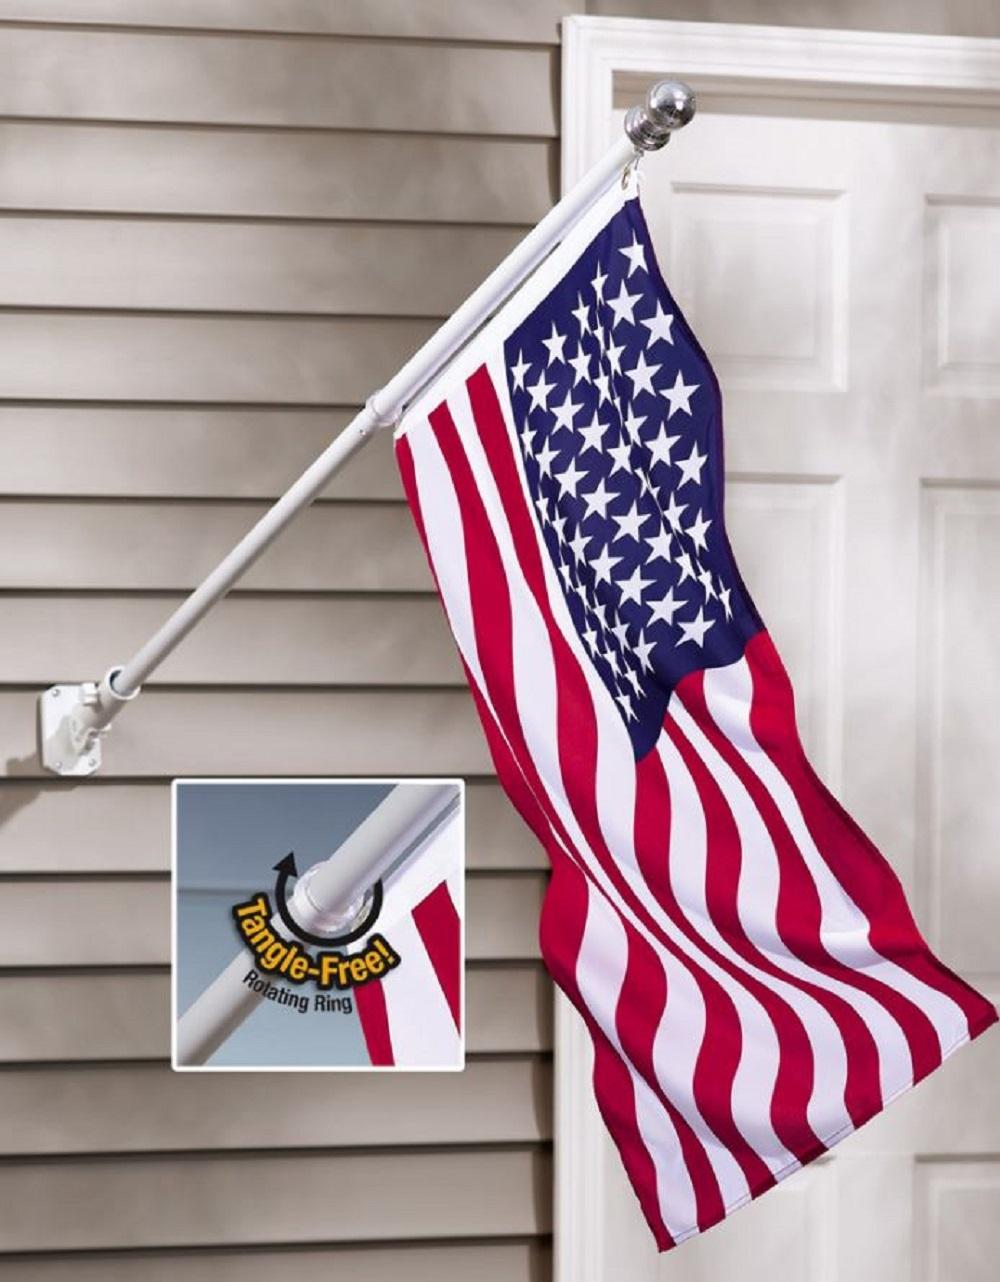 American Flag and Flagpole Rotating Pole Adjustable Porch Banner Display Decor